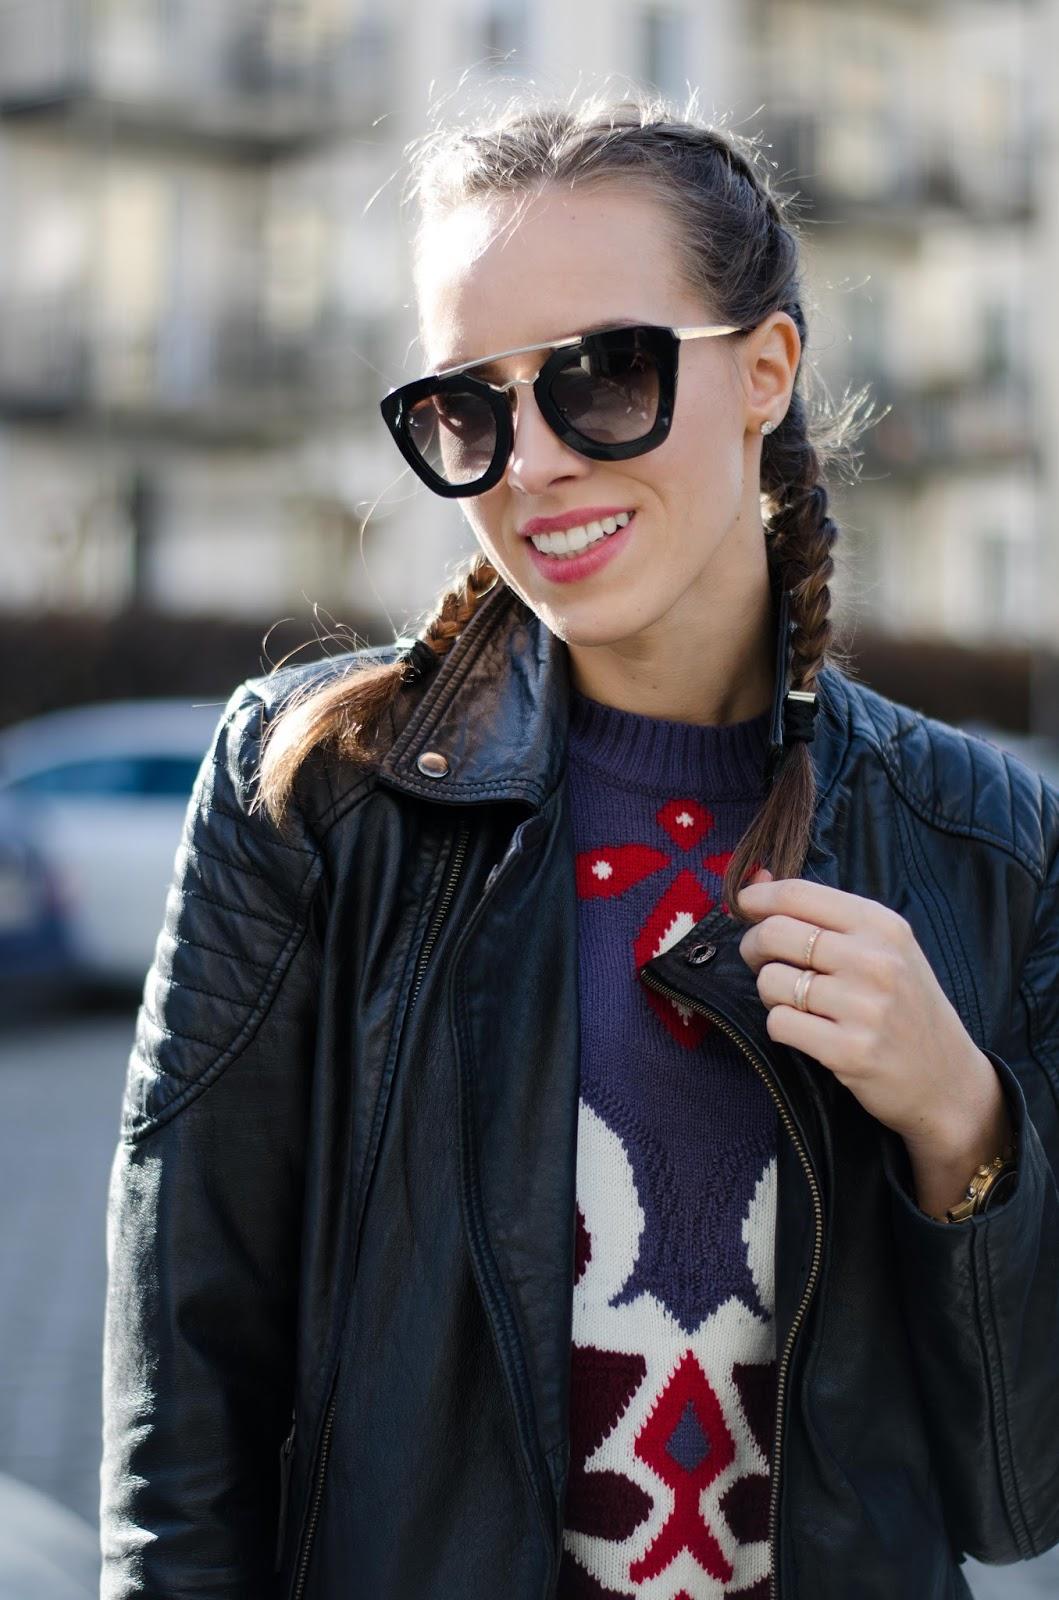 kristjaana mere prada sunglasses barneys leather jacket dutch braids spring fashion